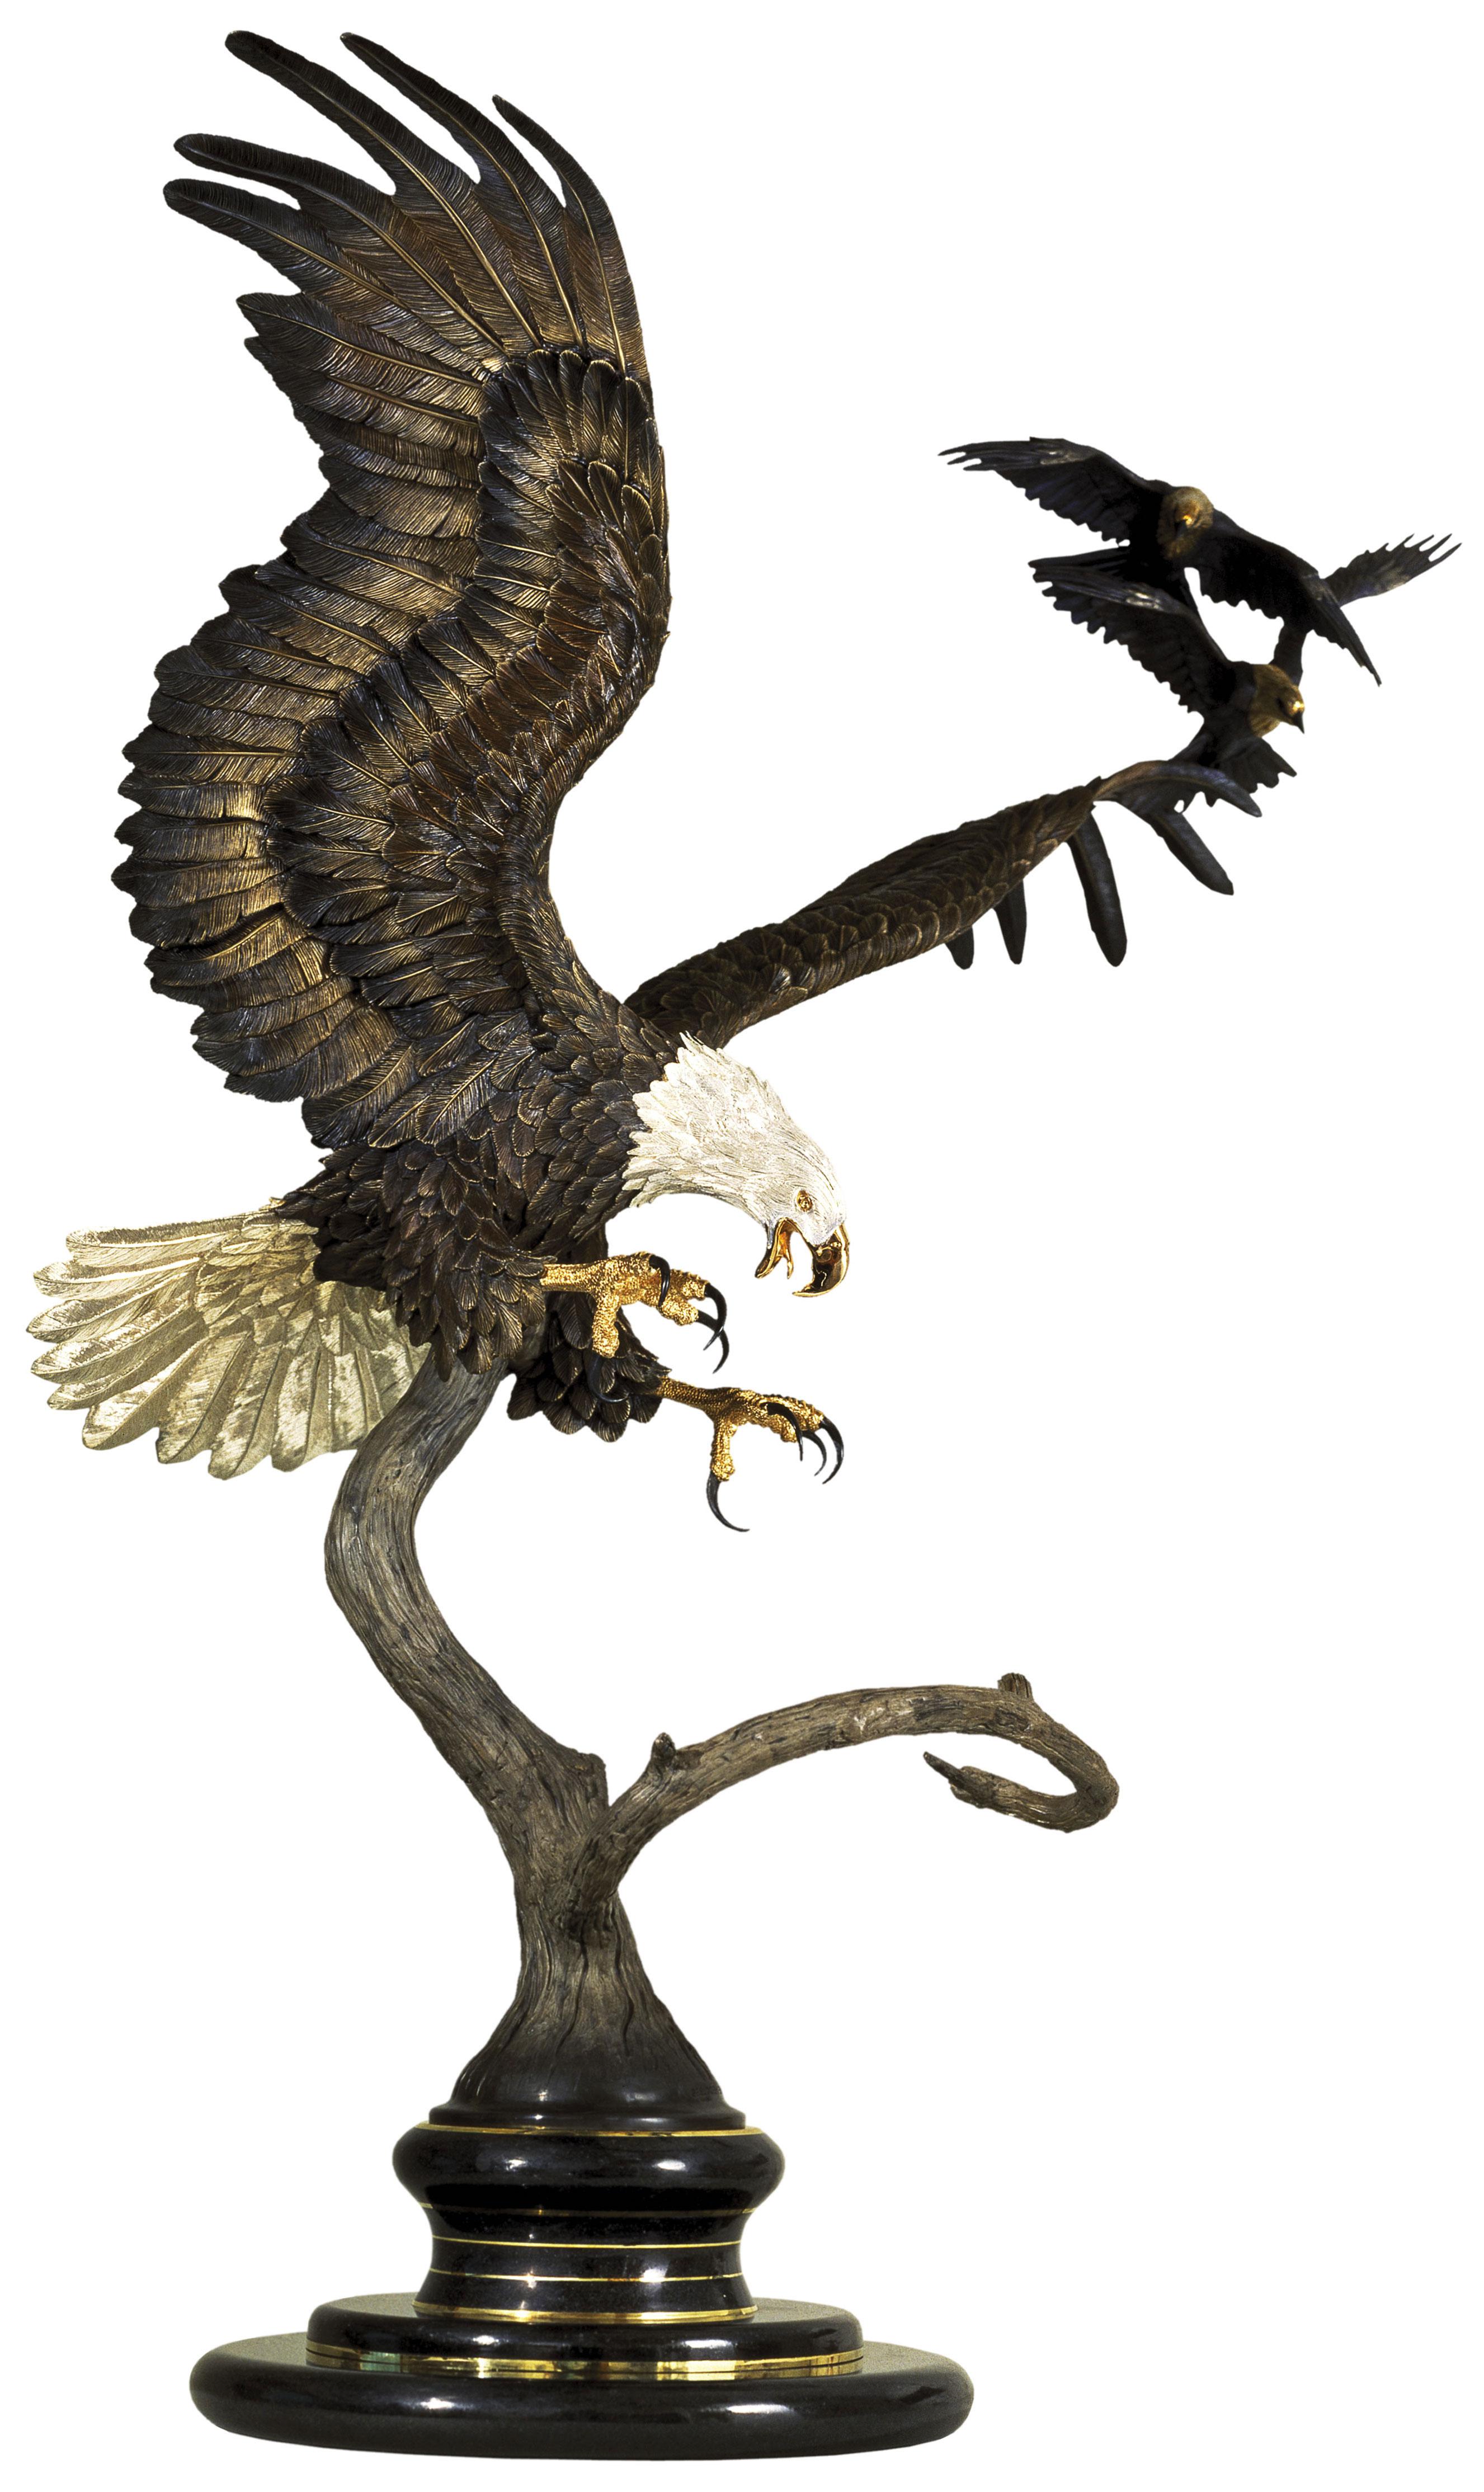 The Hecklers Bronze Eagle Sculpture